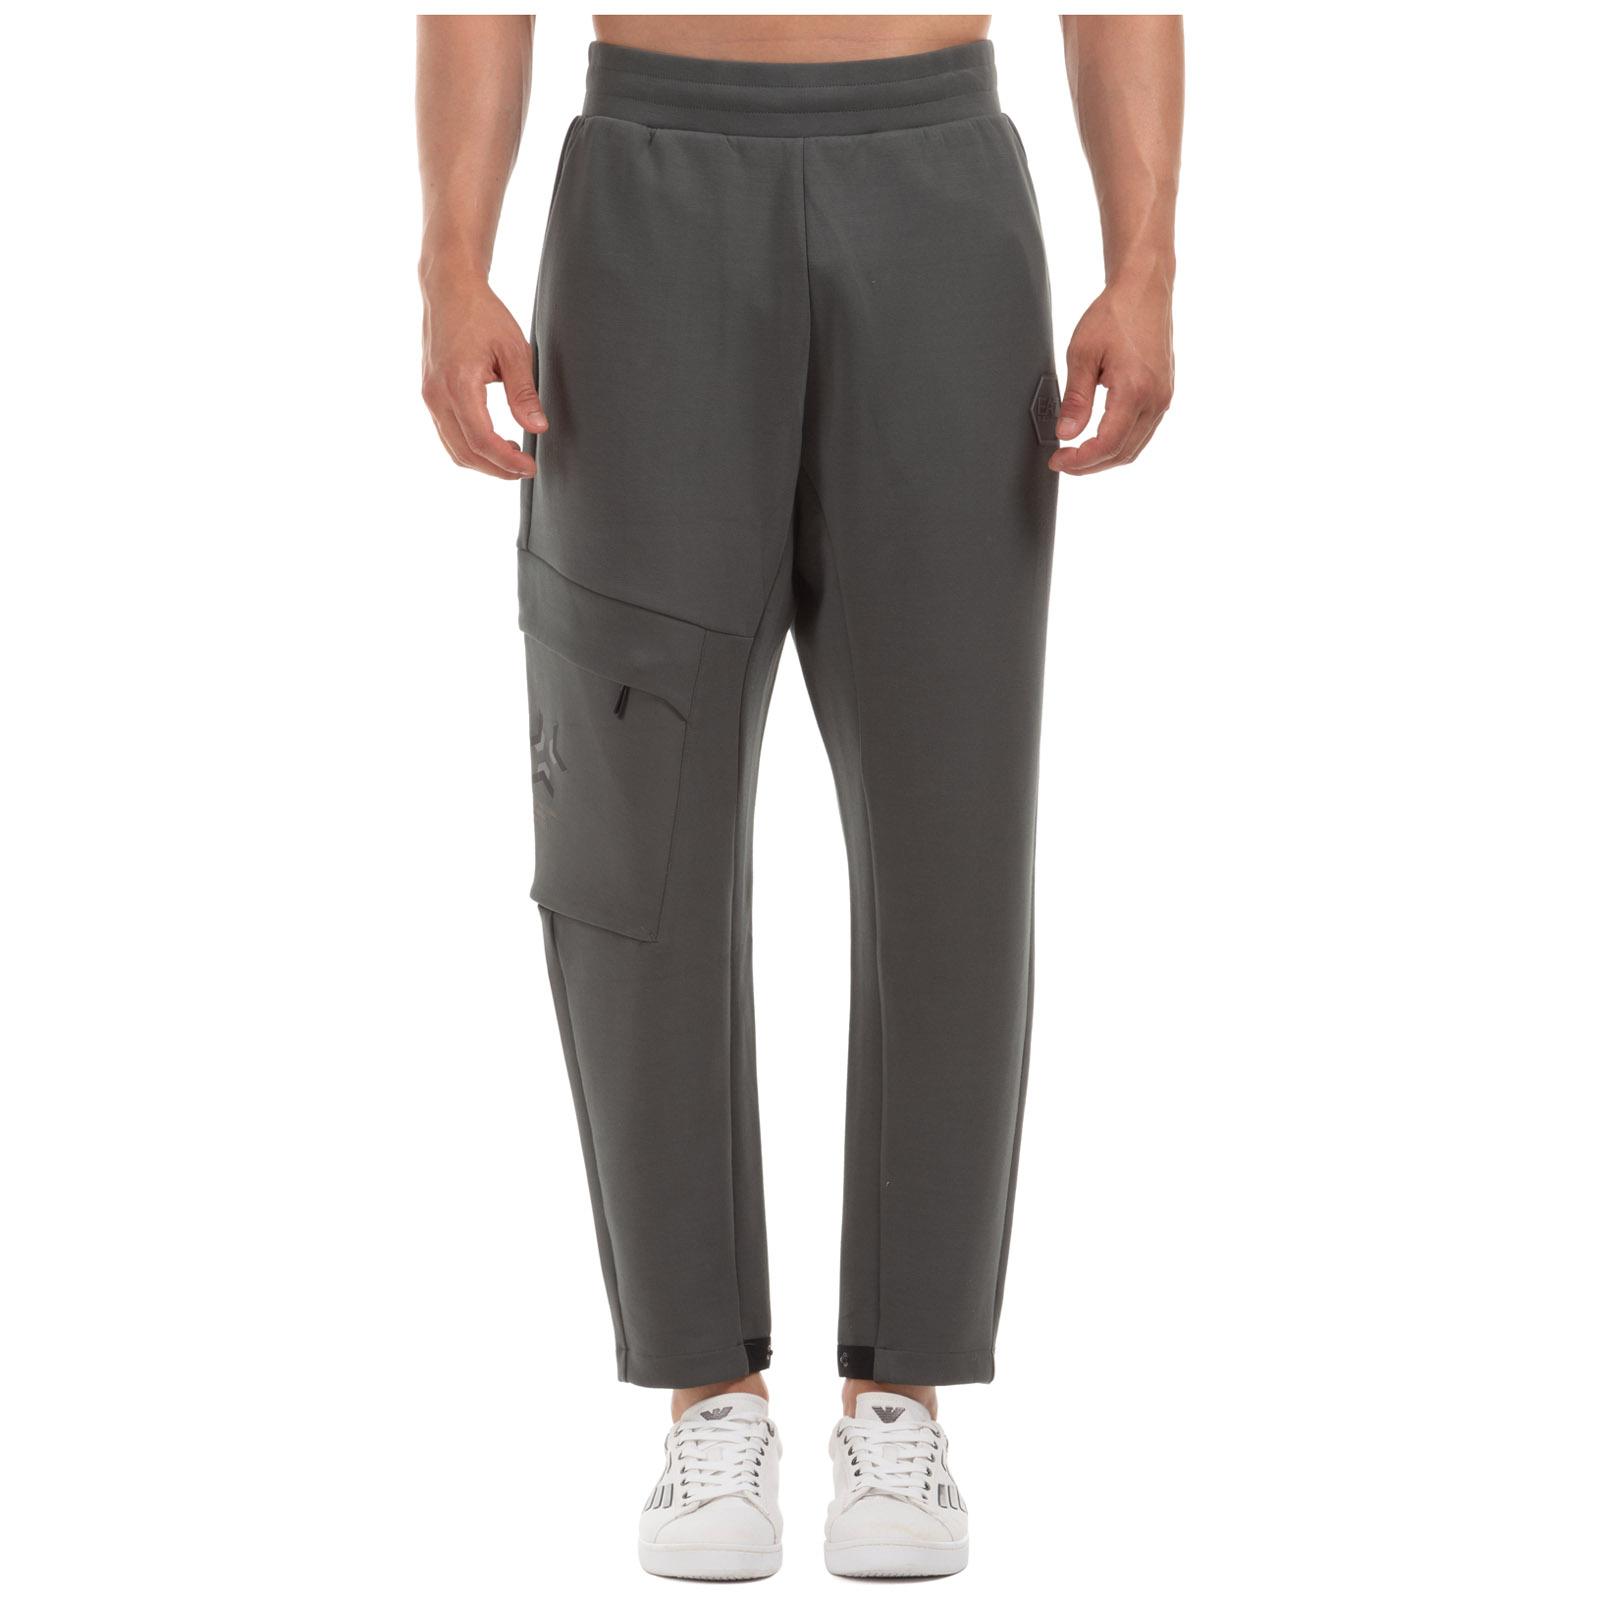 Emporio Armani Men's sport tracksuit trousers  - Green - Size: Medium